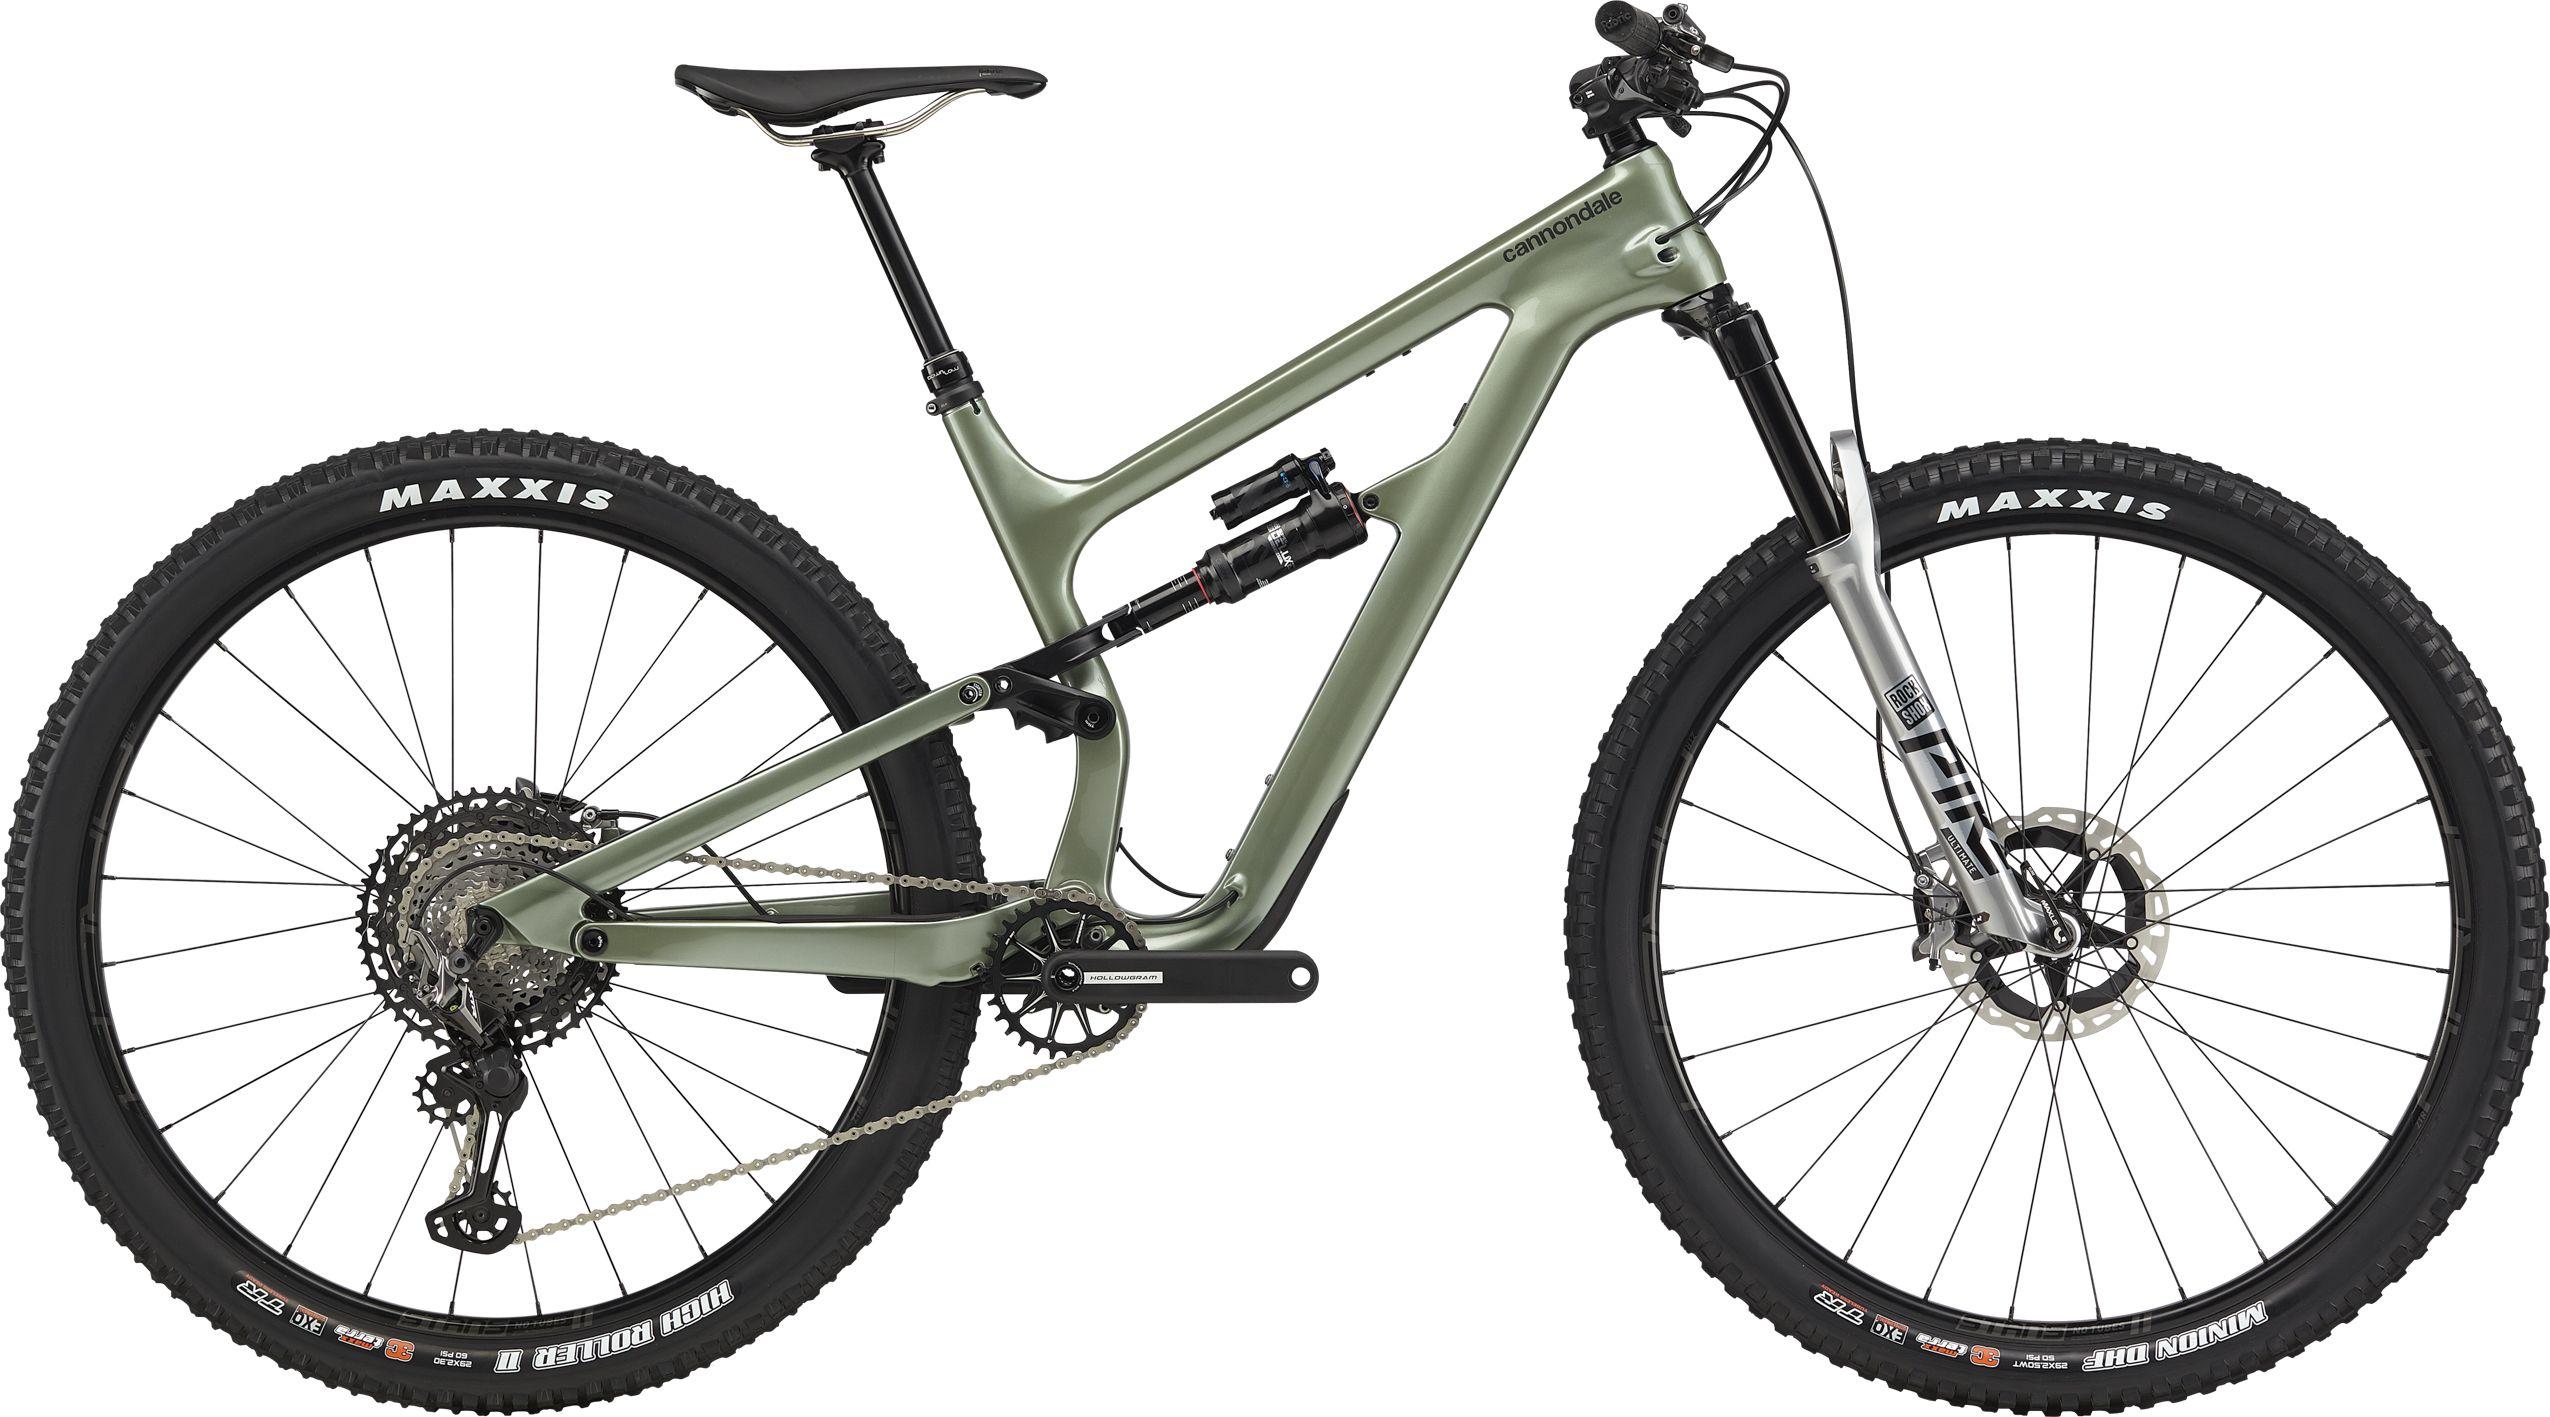 Cannondale Habit Carbon 1 29er Mountain Bike 2020 | Mountainbikes